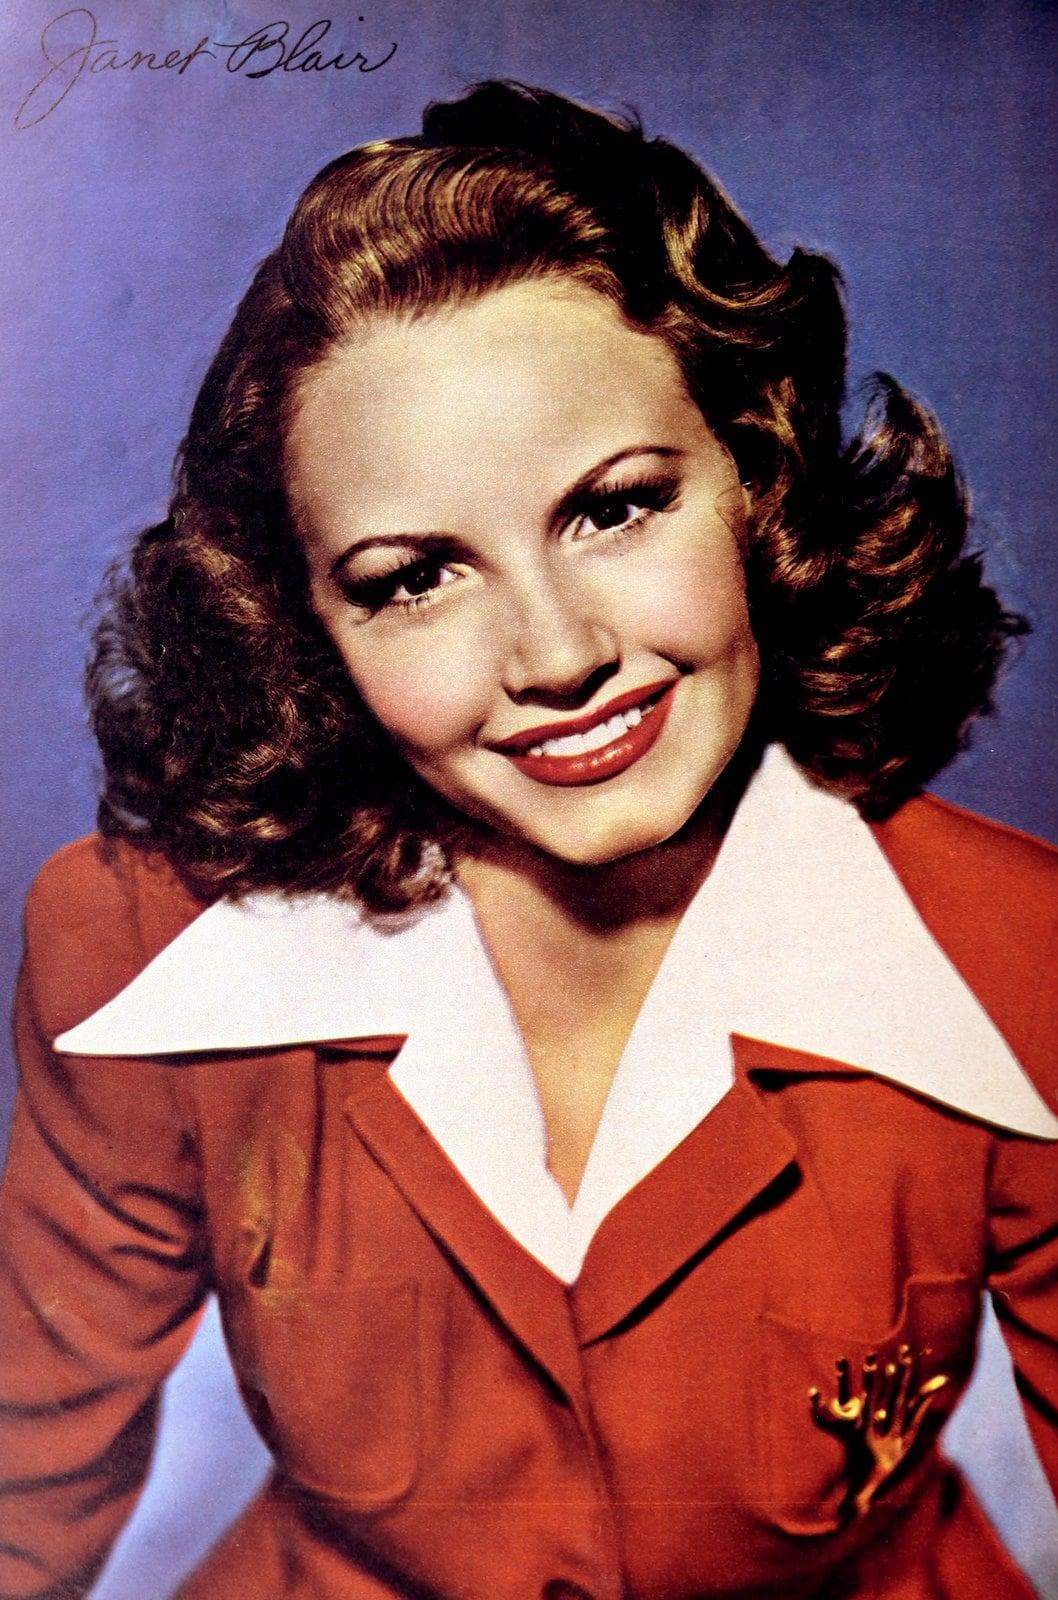 Vintage 1940s actress Janet Blair wearing red lipstick